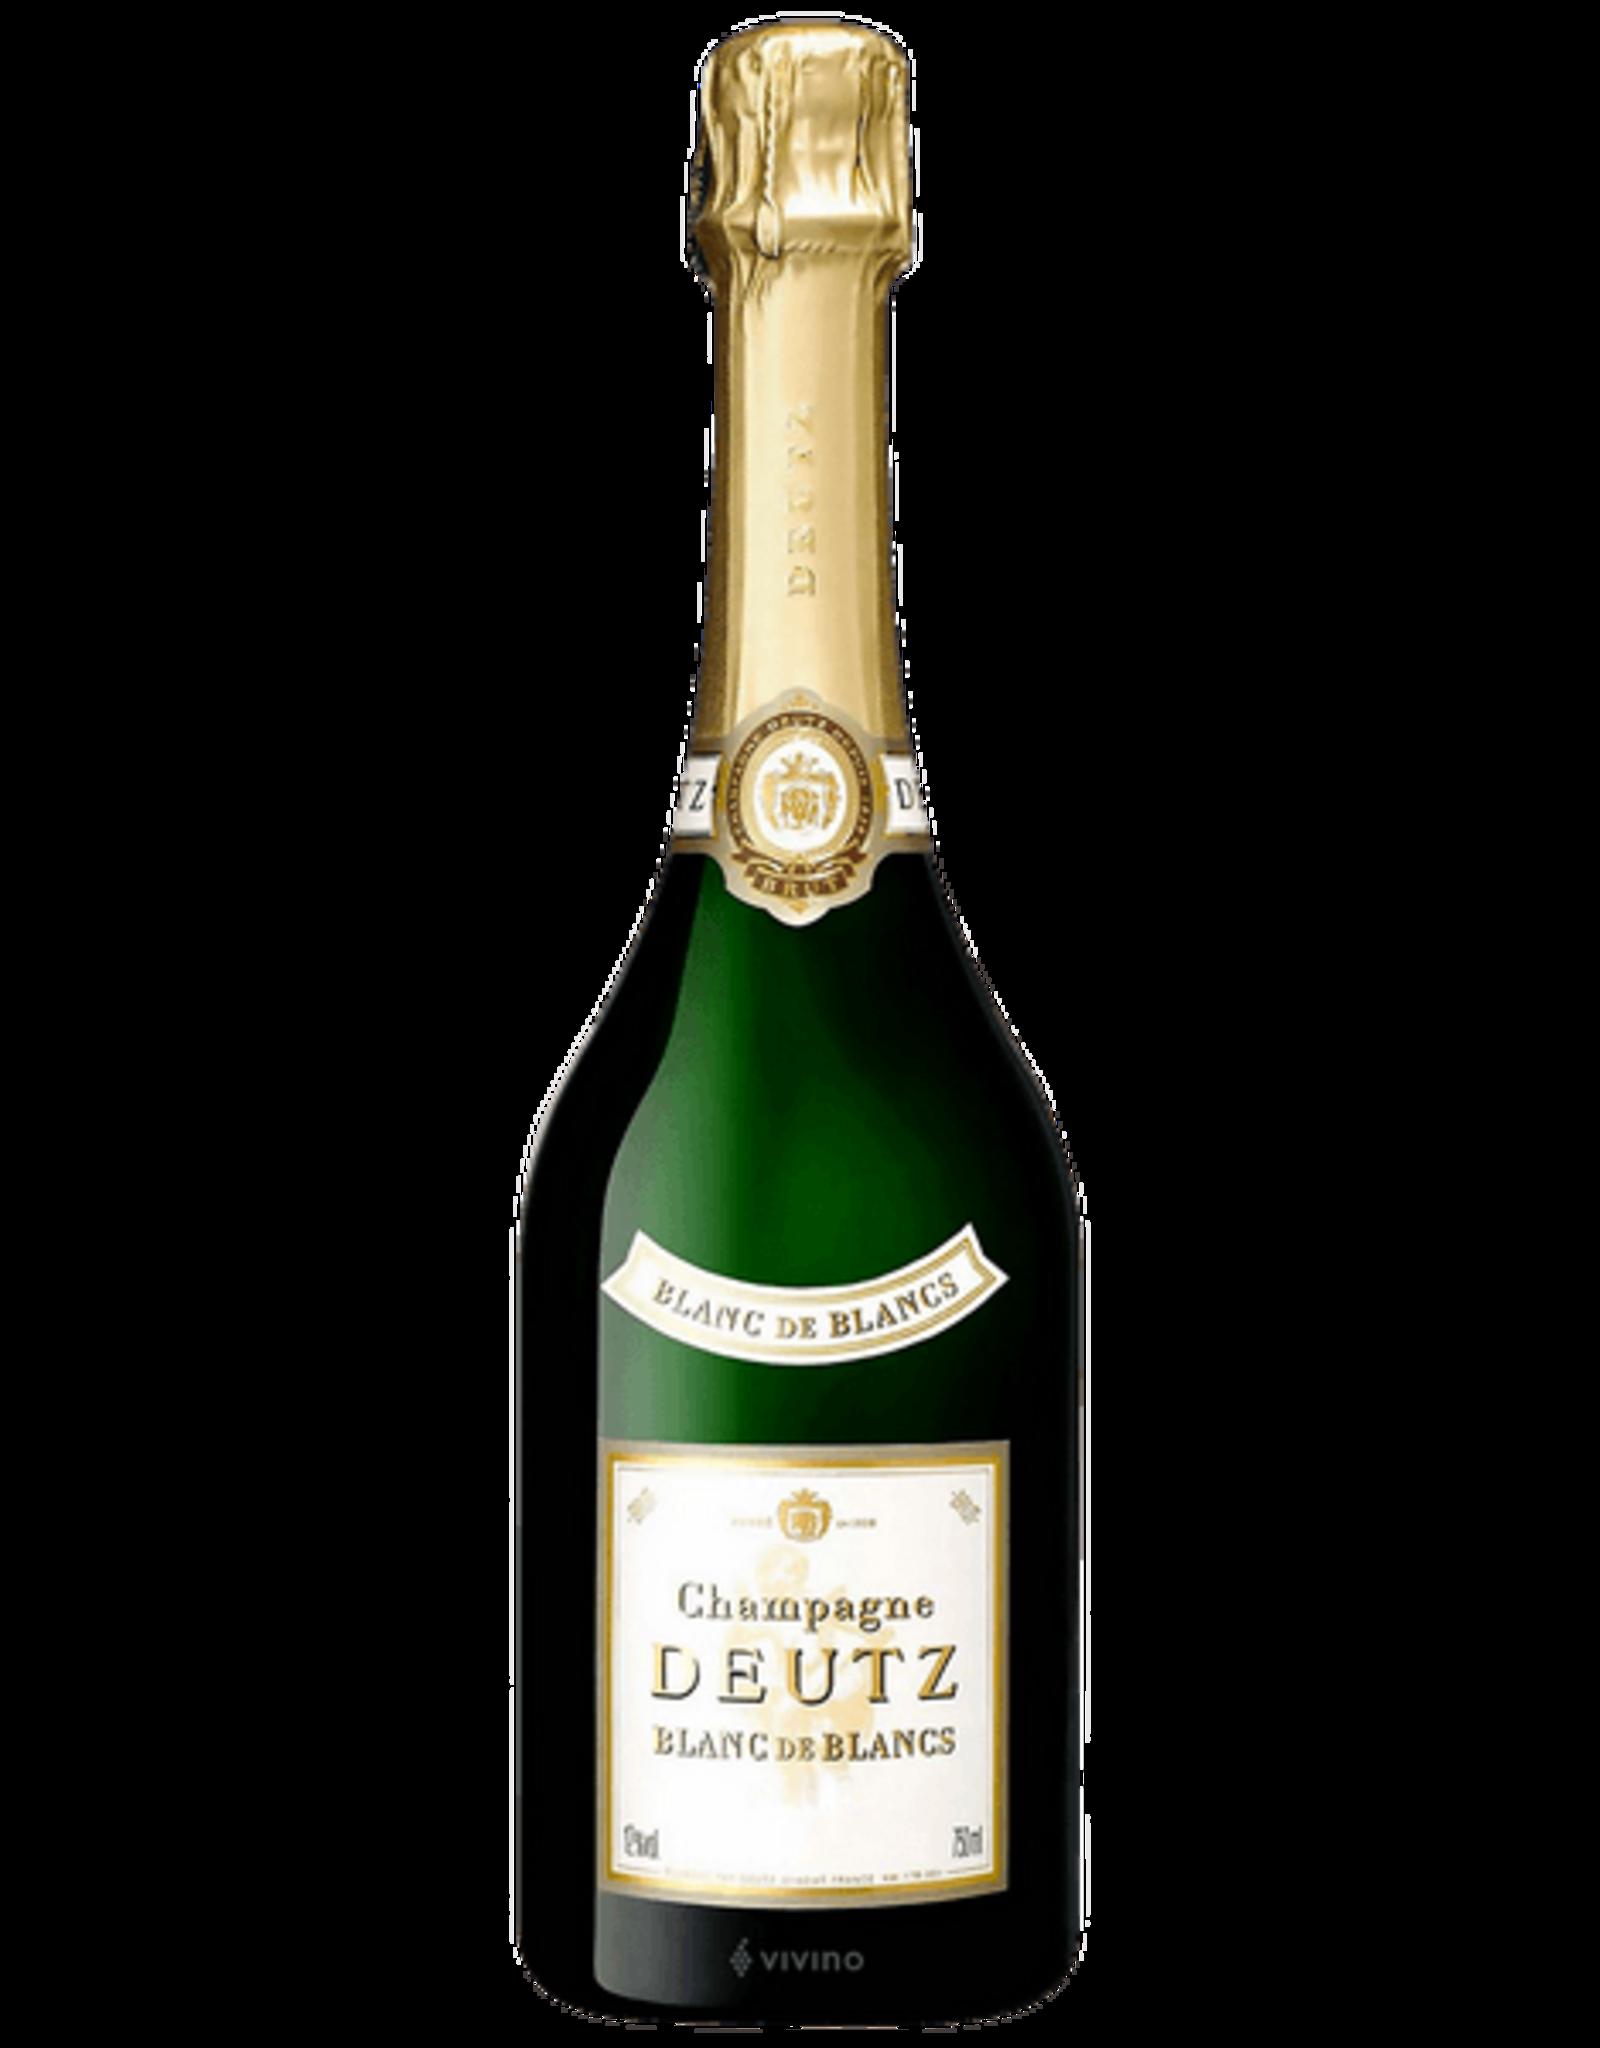 Deutz Deutz Blanc de Blancs Vintage 2014